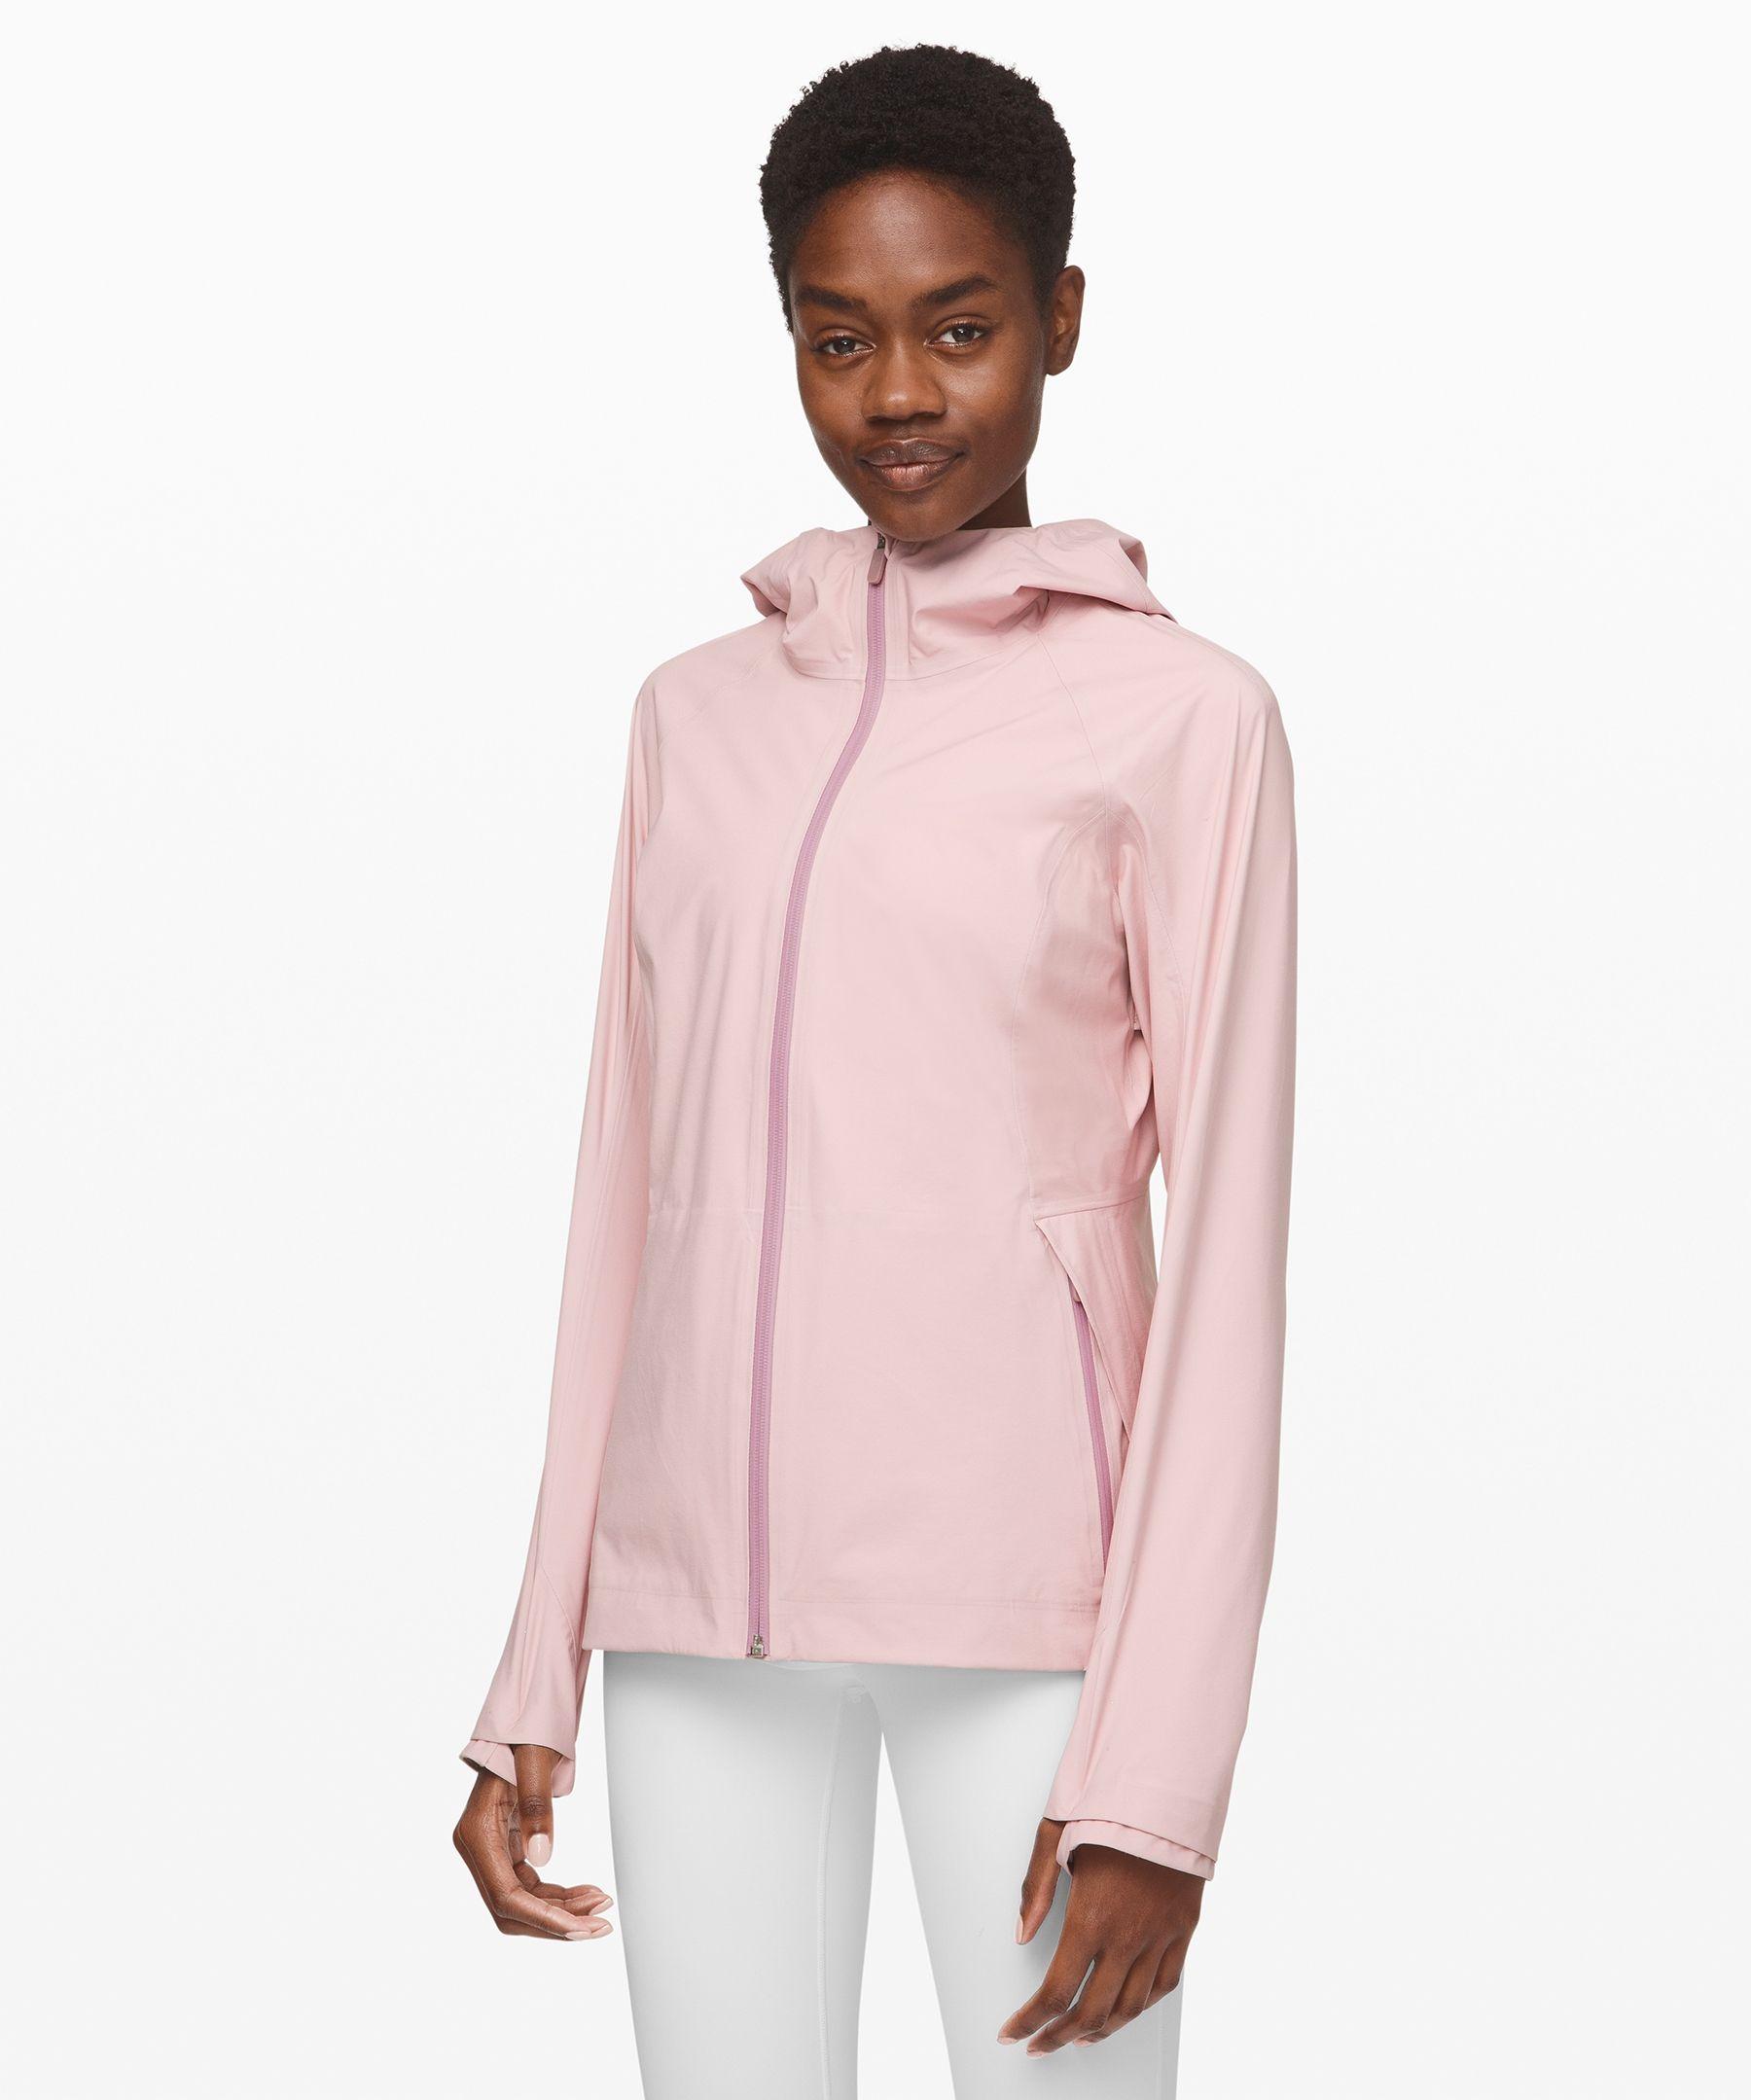 Lululemon The Rain Is Calling Jacket Ii Lululemon Cloth Jackets Technical Clothing Coats Jackets Women [ 2159 x 1800 Pixel ]